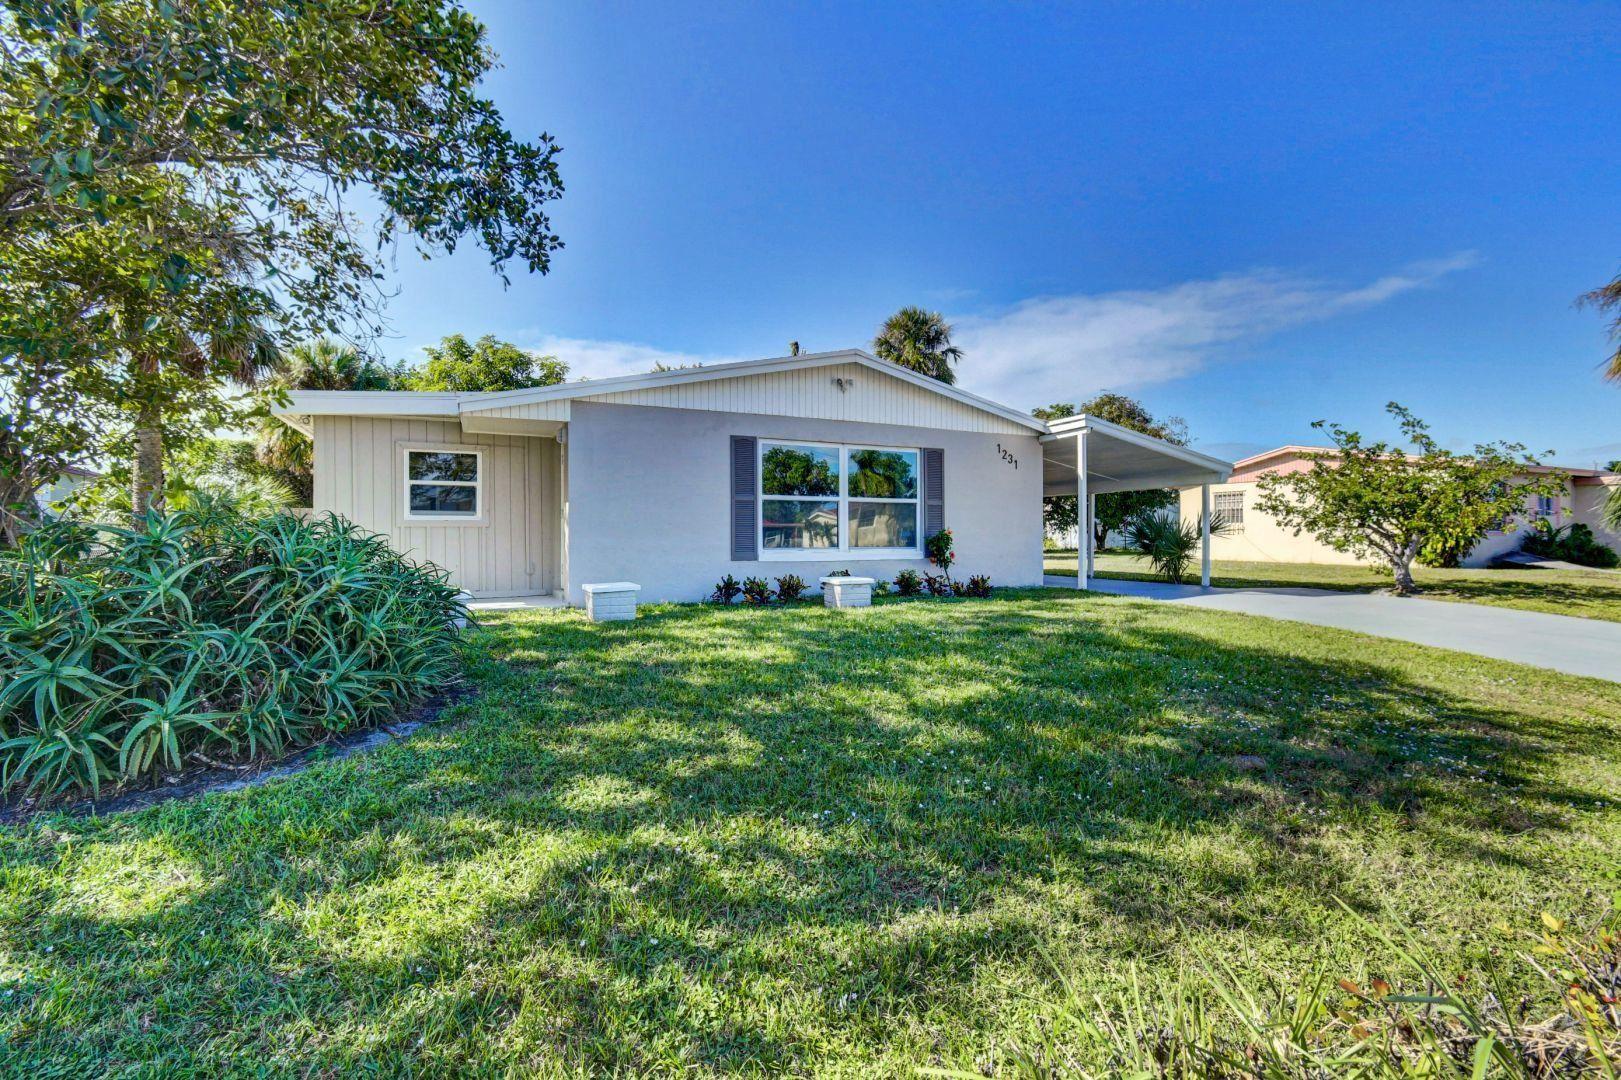 1231 R Avenue, Riviera Beach, FL 33404 - #: RX-10660355